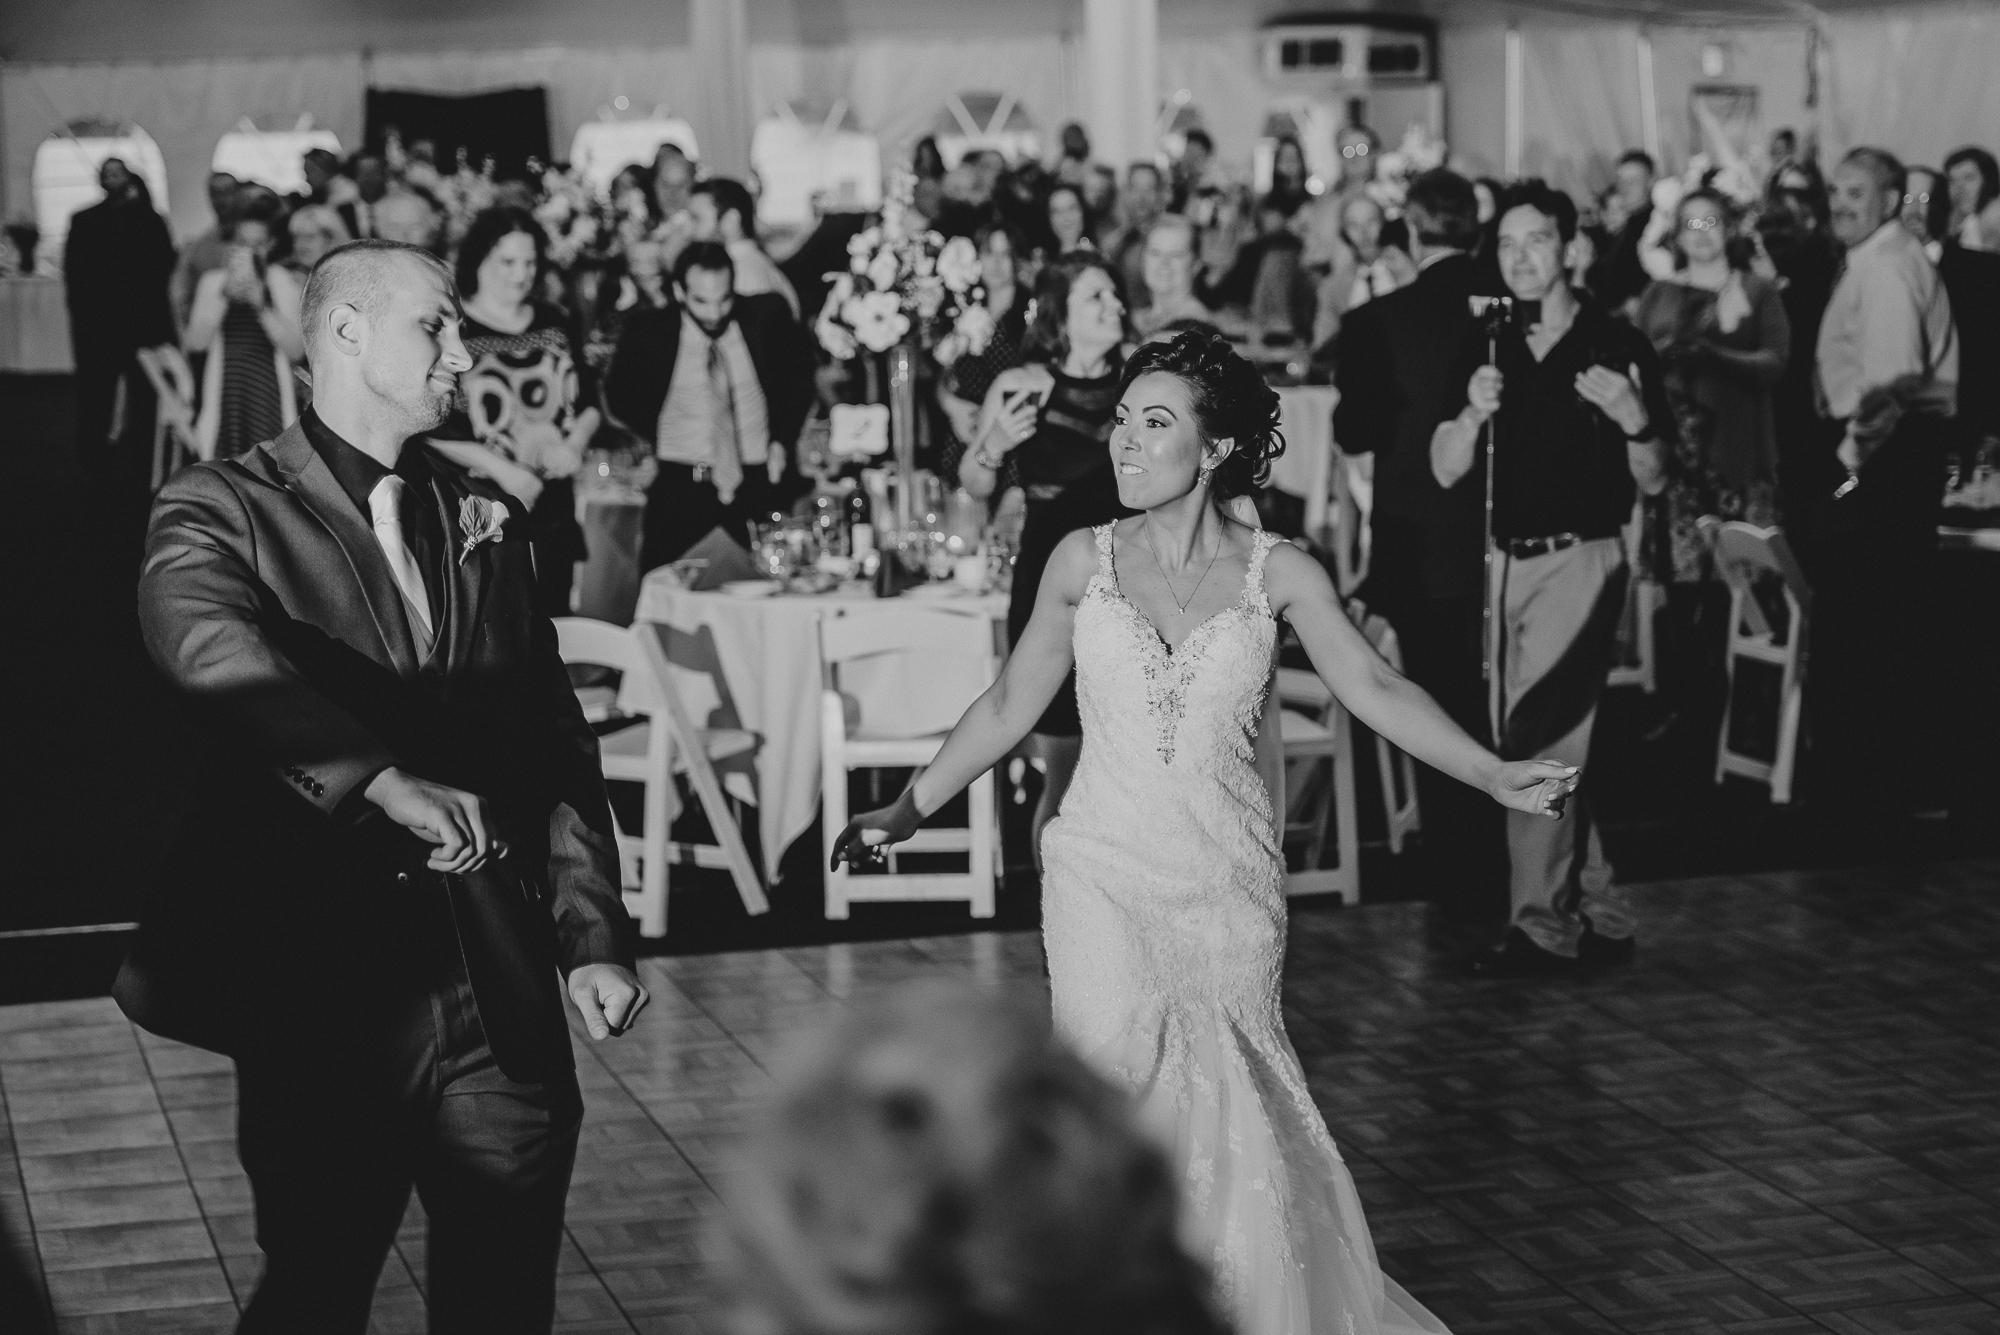 Christina-and-Gene-Wedding-Marla-Rain-Photography-471.jpg